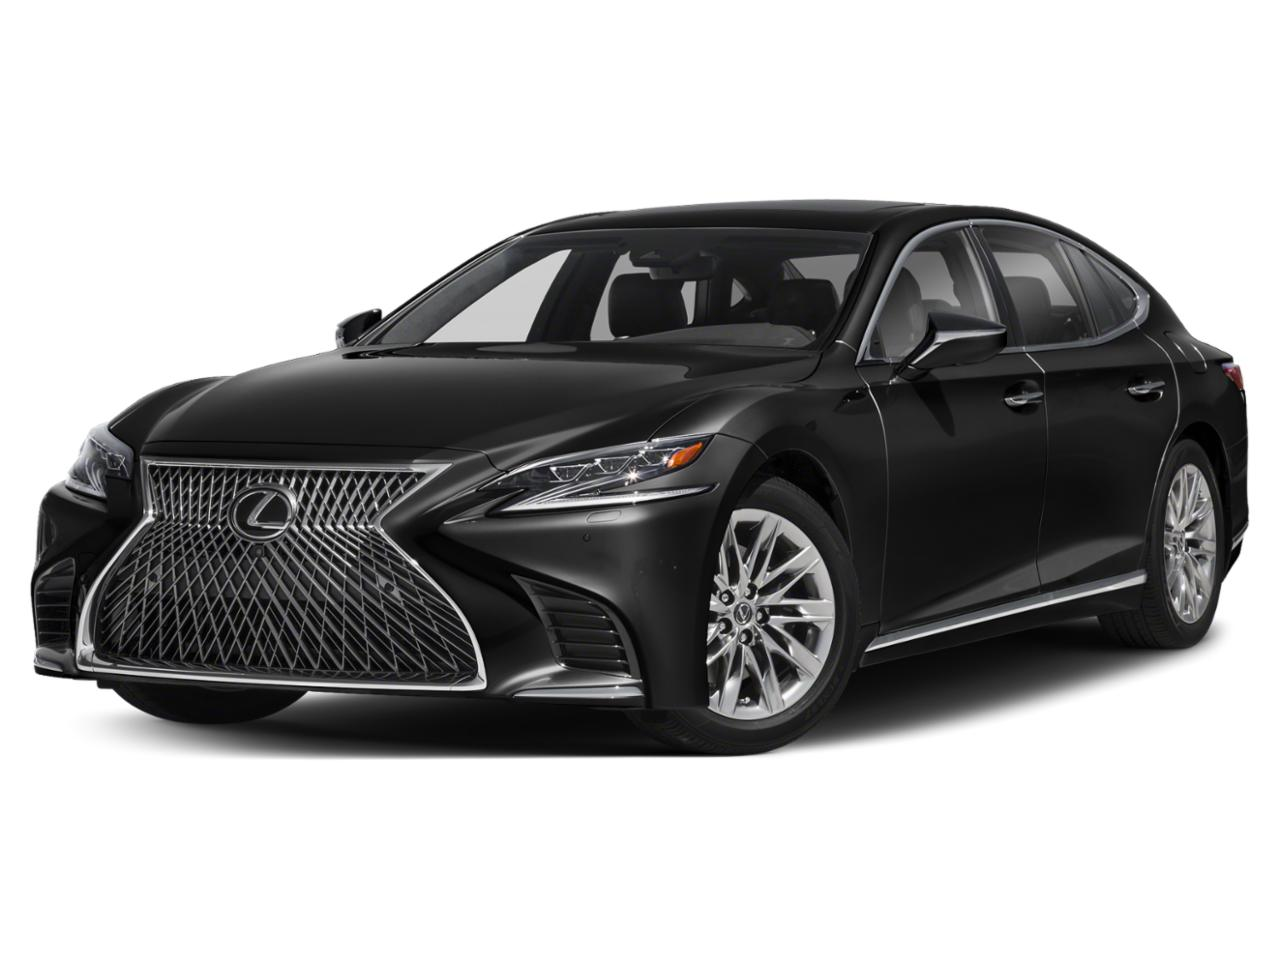 2018 Lexus LS 500 Vehicle Photo in Houston, TX 77546